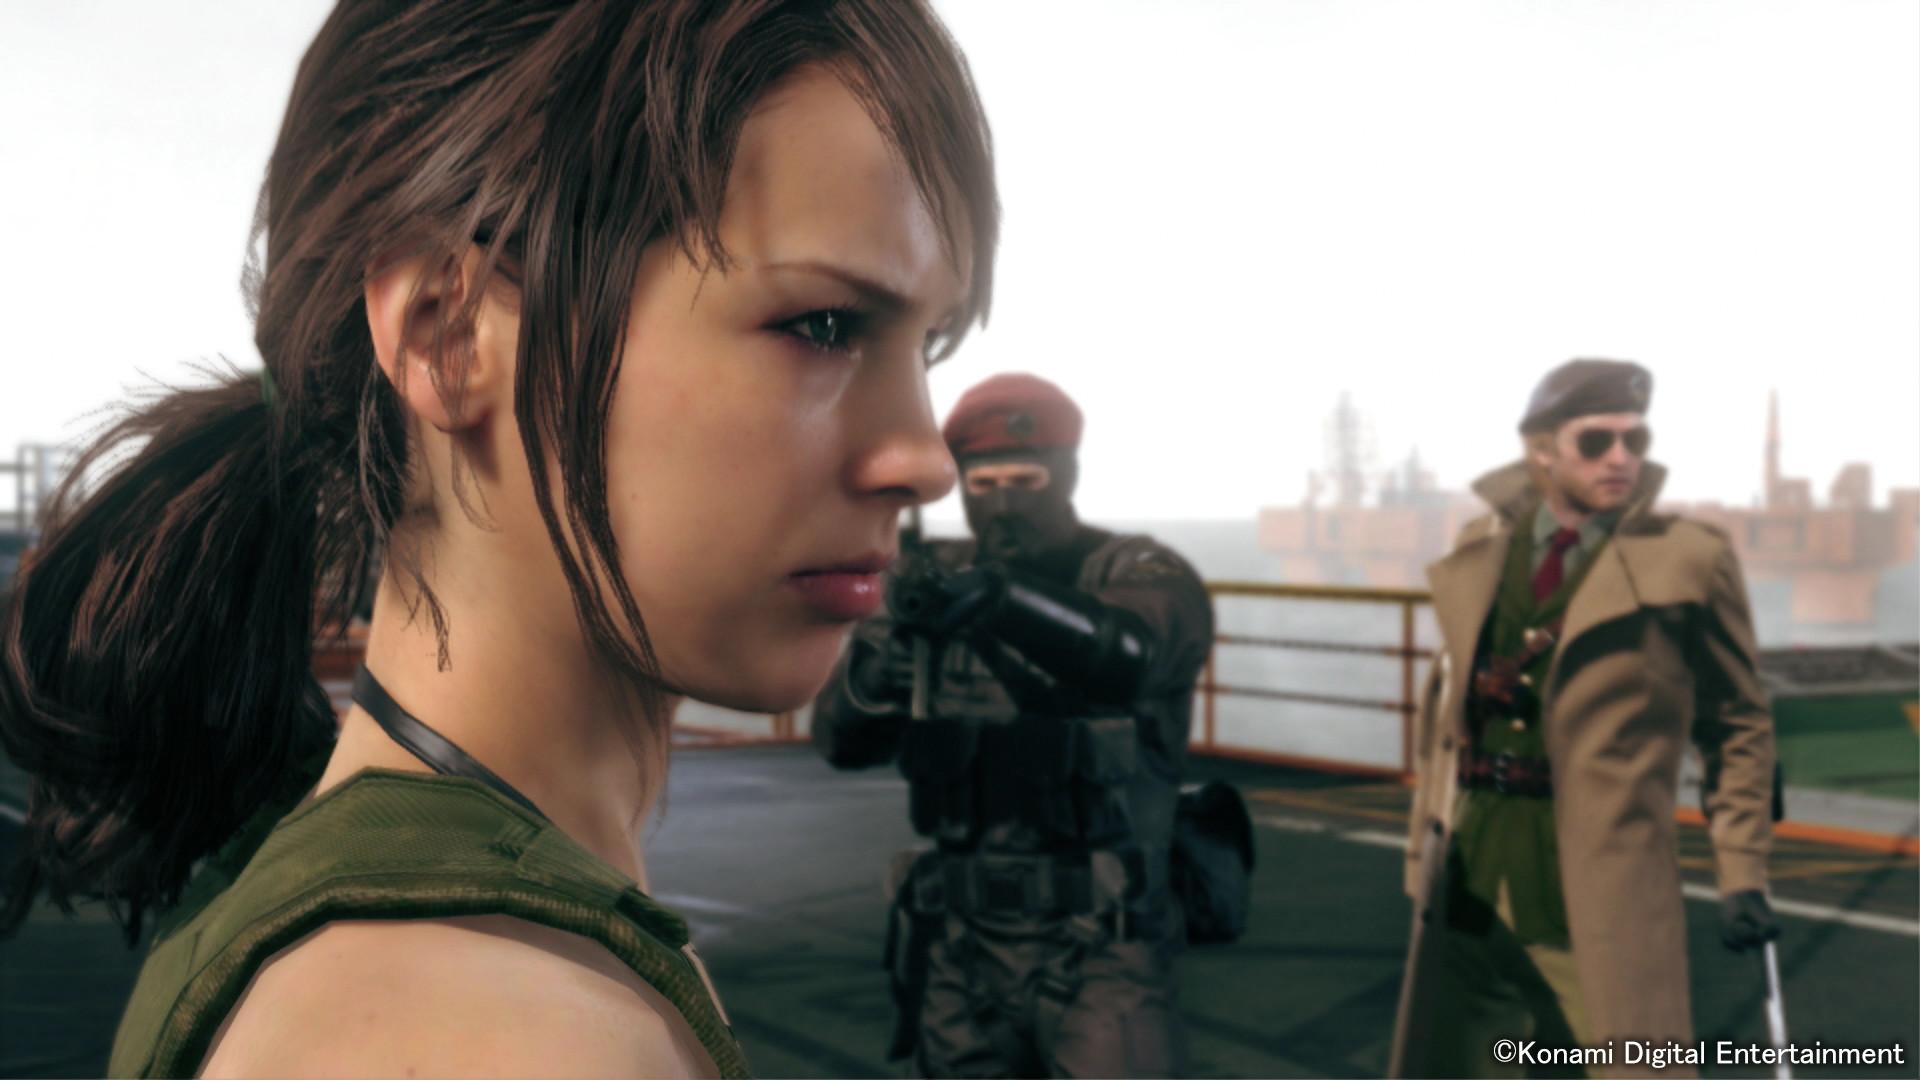 Metal Gear Solid 5 PS4 Patch Fixes Quiet Bug, Buffs Daily Login Bonus –  GameSpot